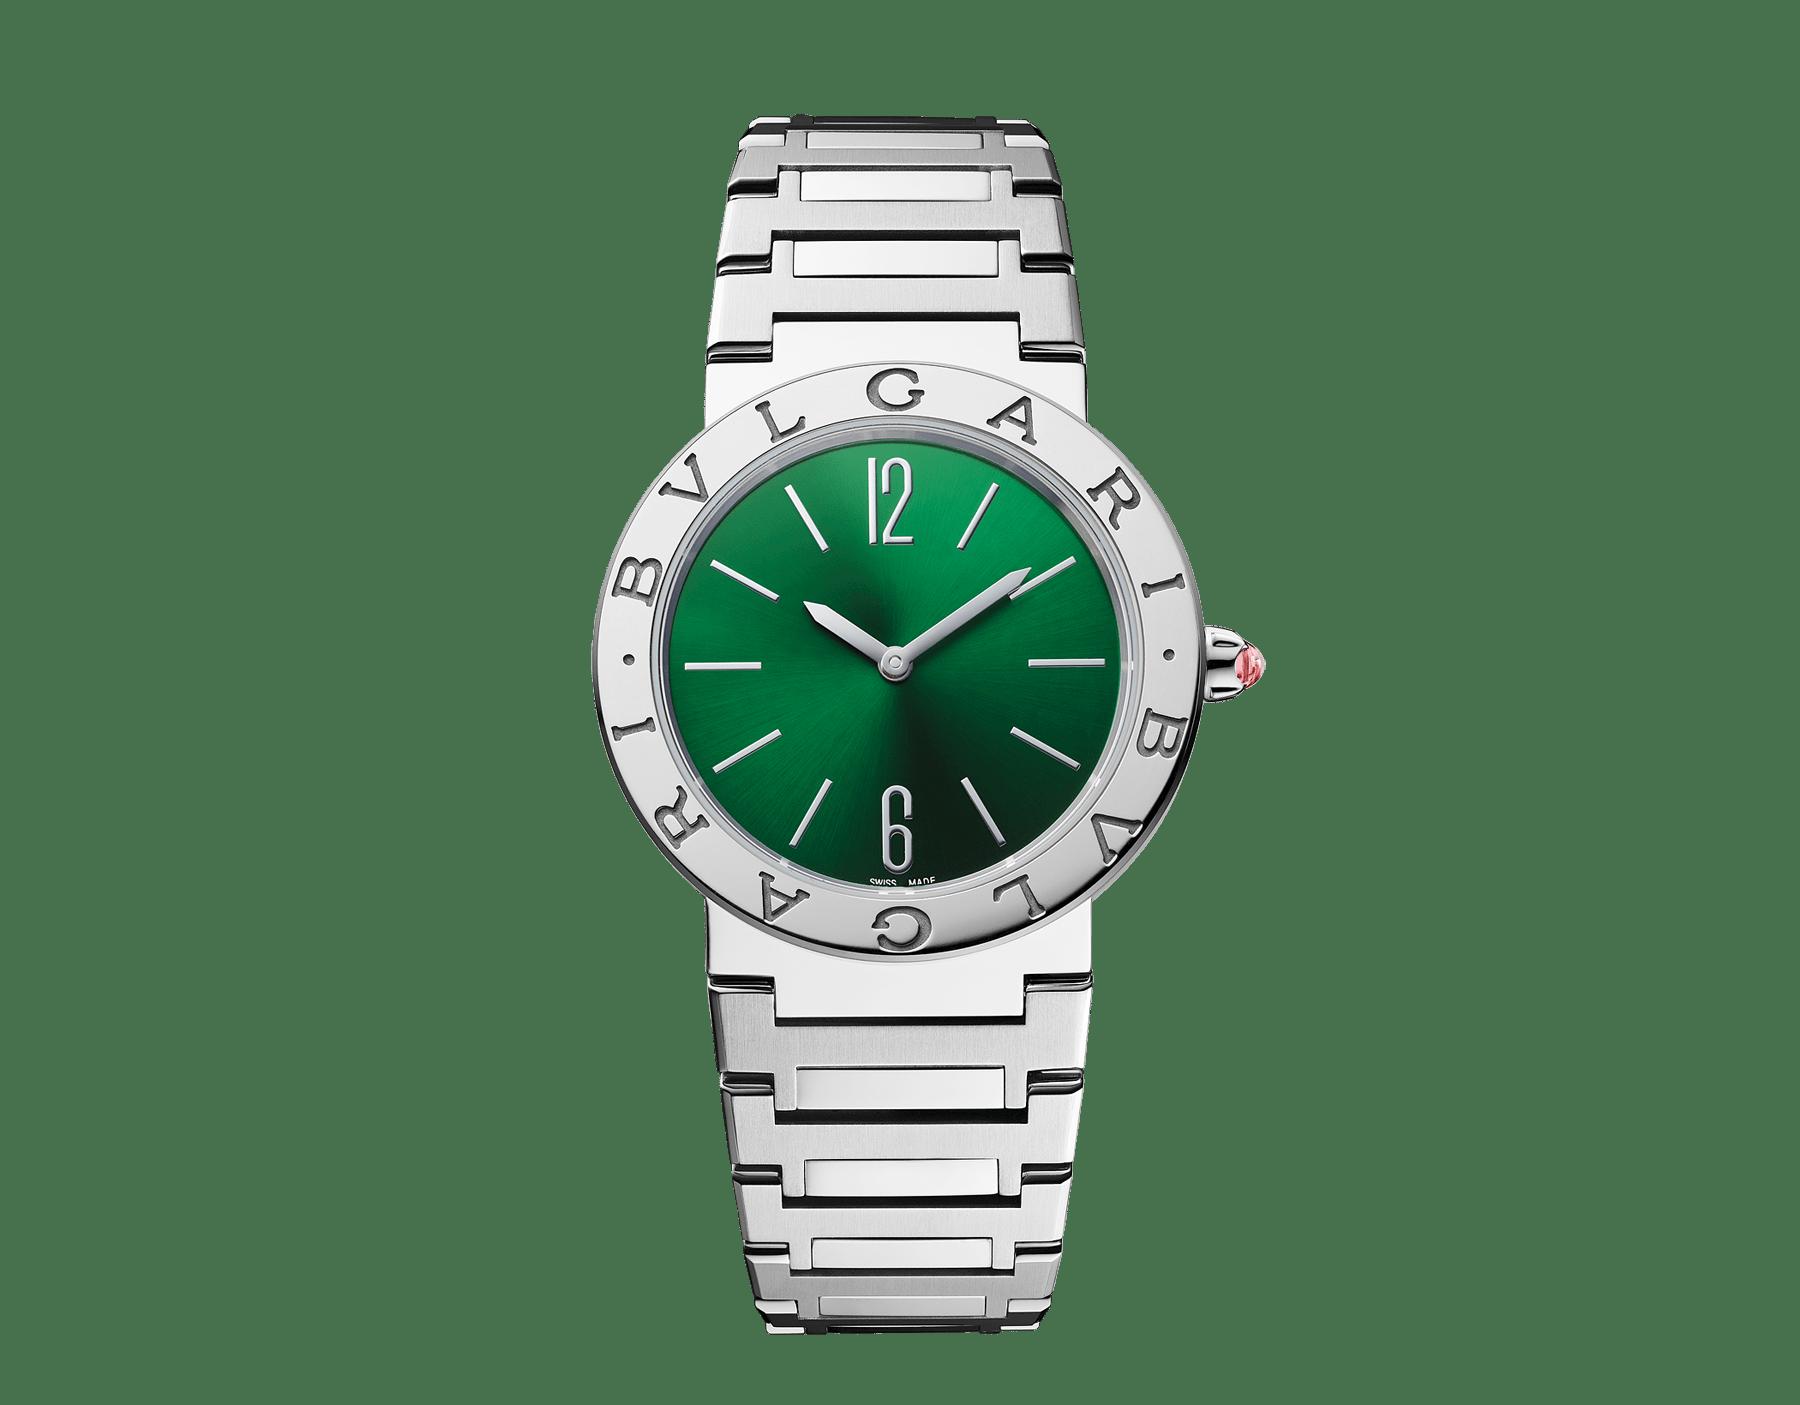 BVLGARI BVLGARI LADY 腕錶,精鋼錶殼和錶帶,精鋼錶圈鐫刻雙品牌標誌,綠色太陽放射紋錶盤。 103066 image 1